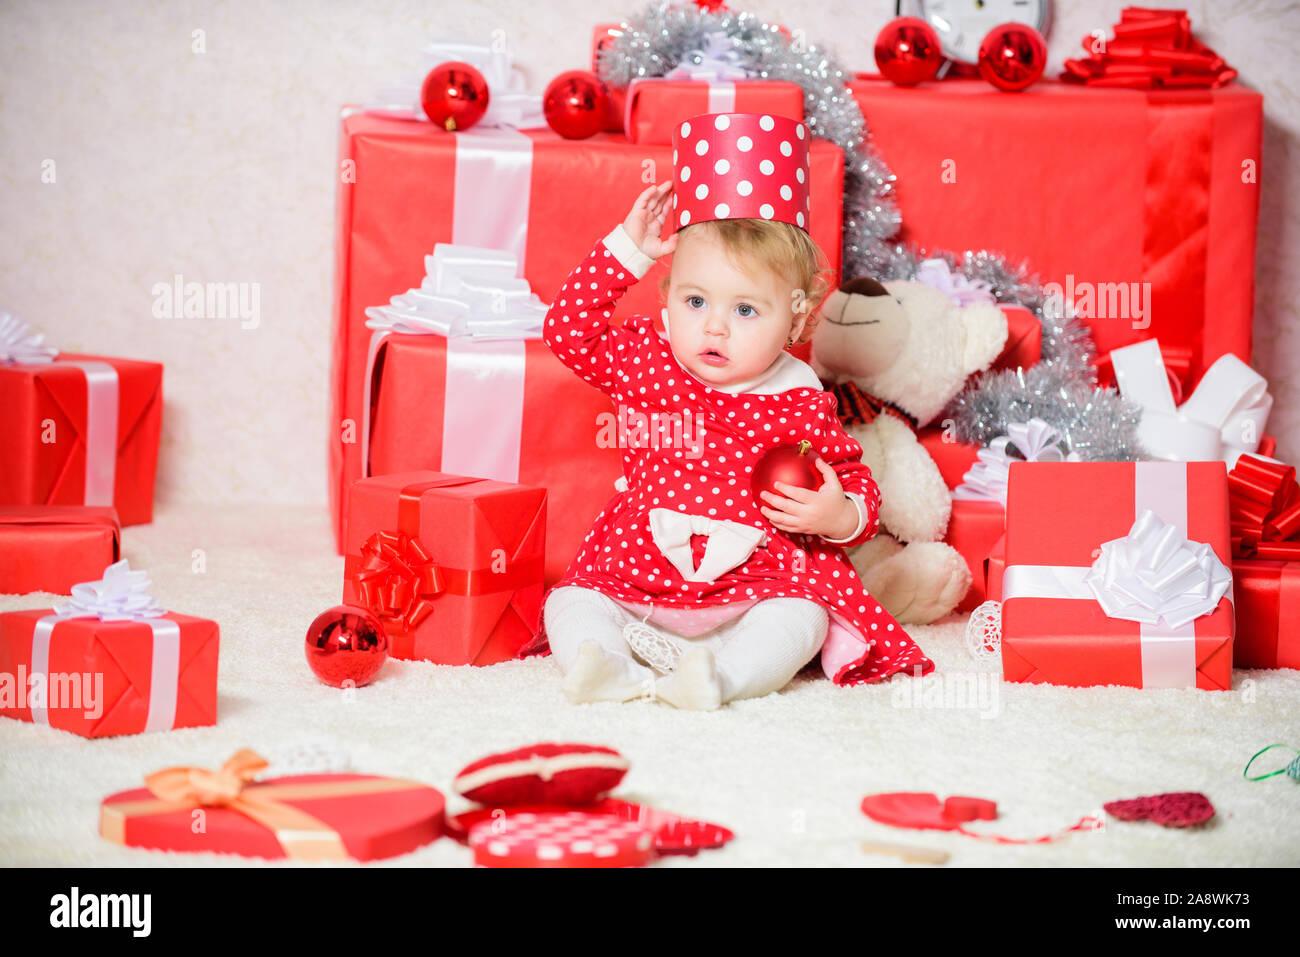 Regalos Para Ninos Pequenos.Actividades De Navidad Para Ninos Pequenos Regalos De